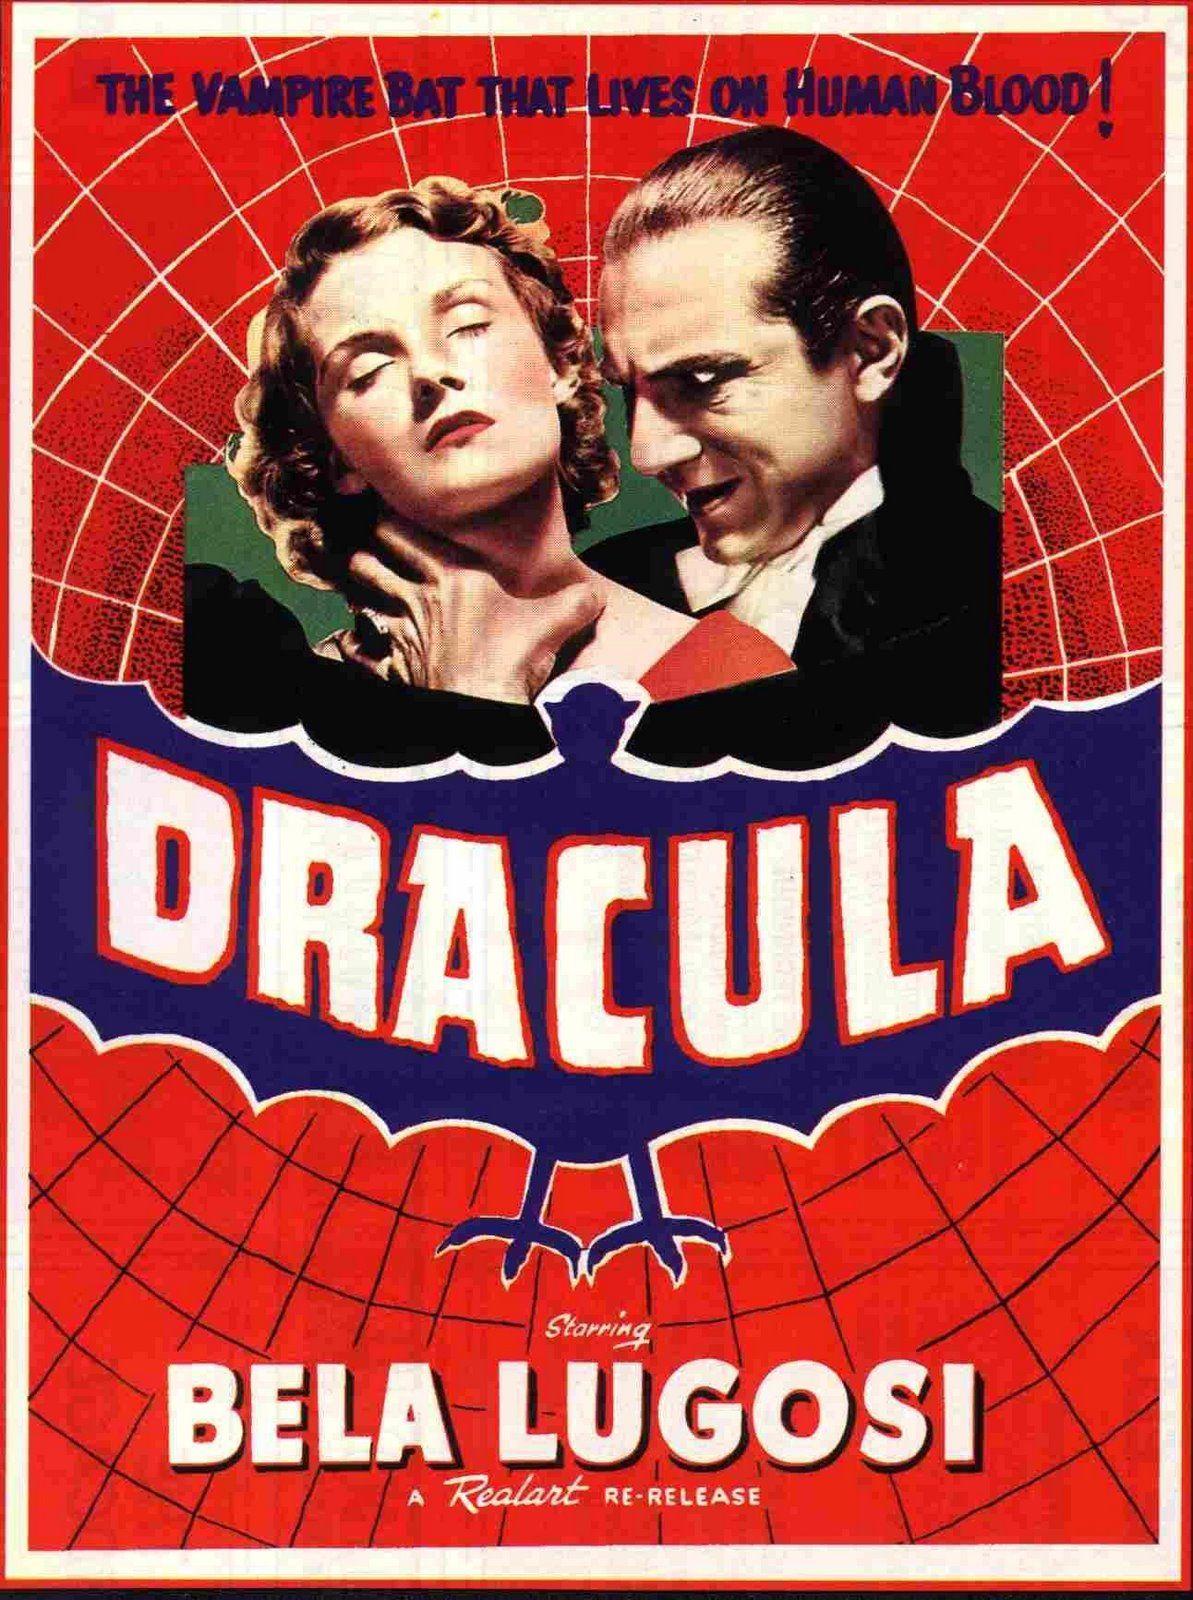 Dracula 1931 Poster 05 Jpg 1193 1600 Posters De Filmes Cartazes De Filmes De Terror Cartazes De Filmes